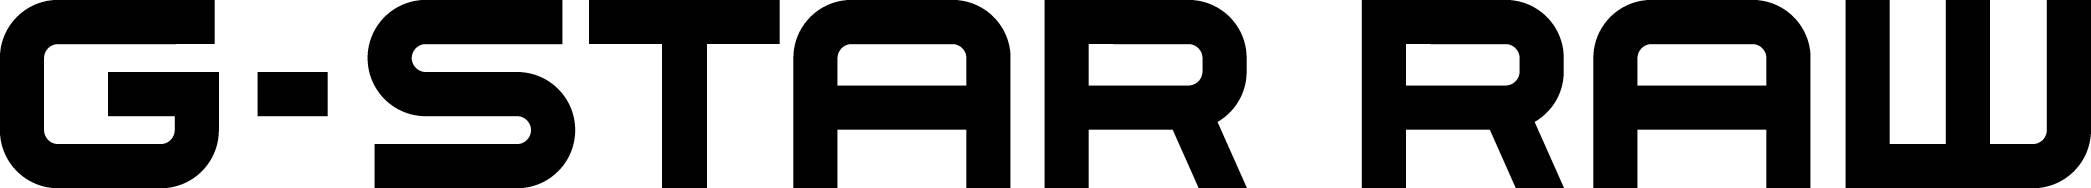 G-star logos 2